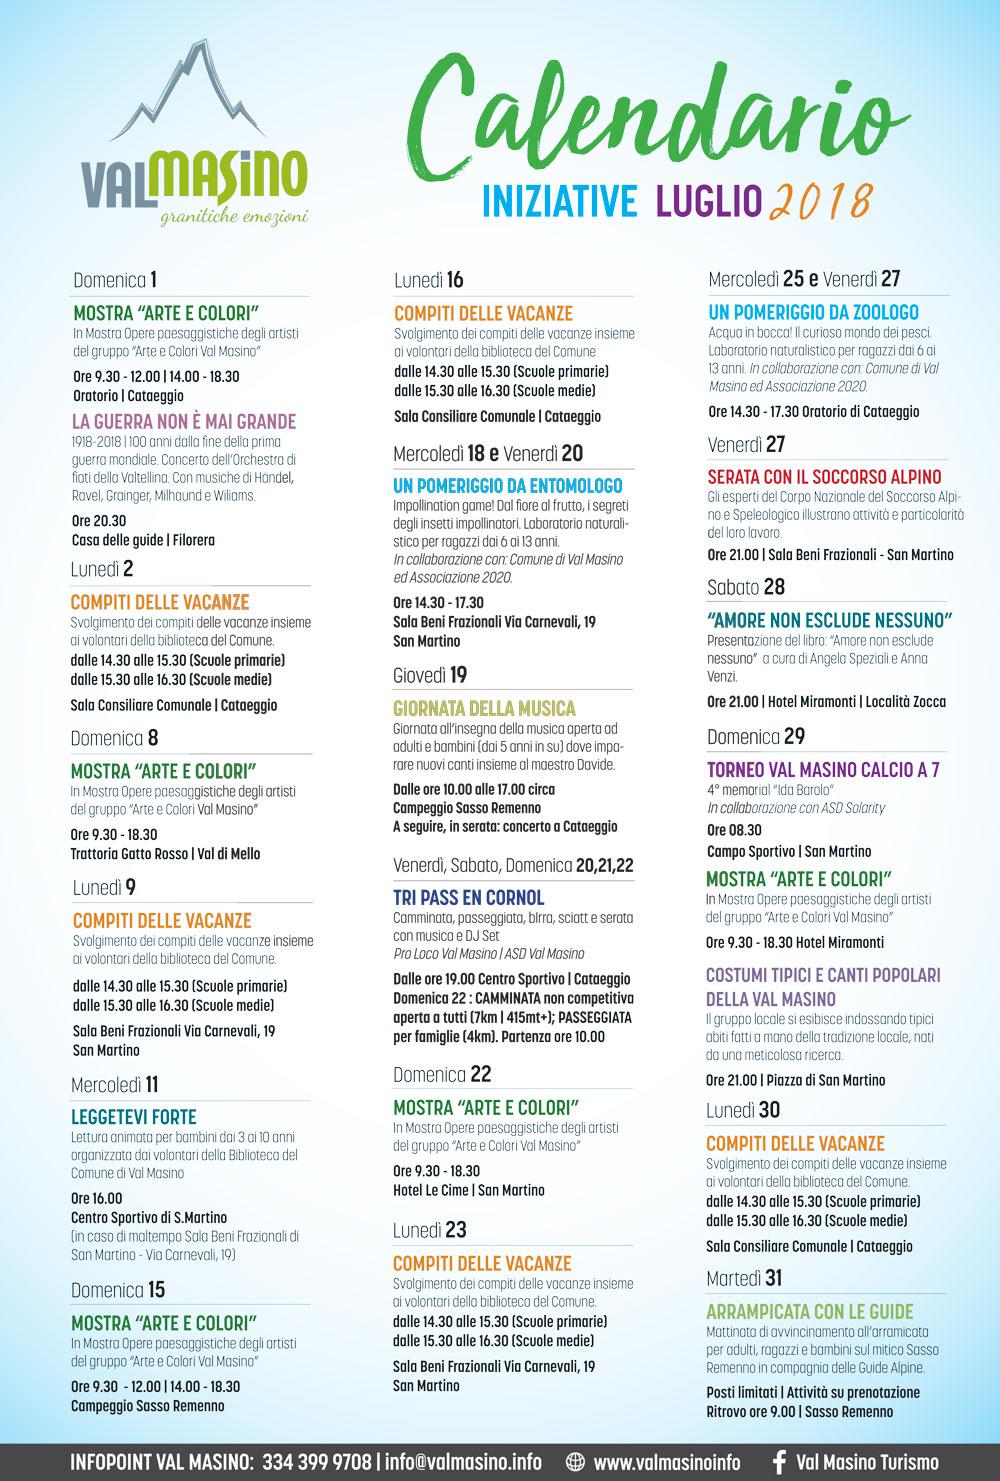 Birre Medie Calendario.Calendario Iniziative Luglio 2018 Val Masino